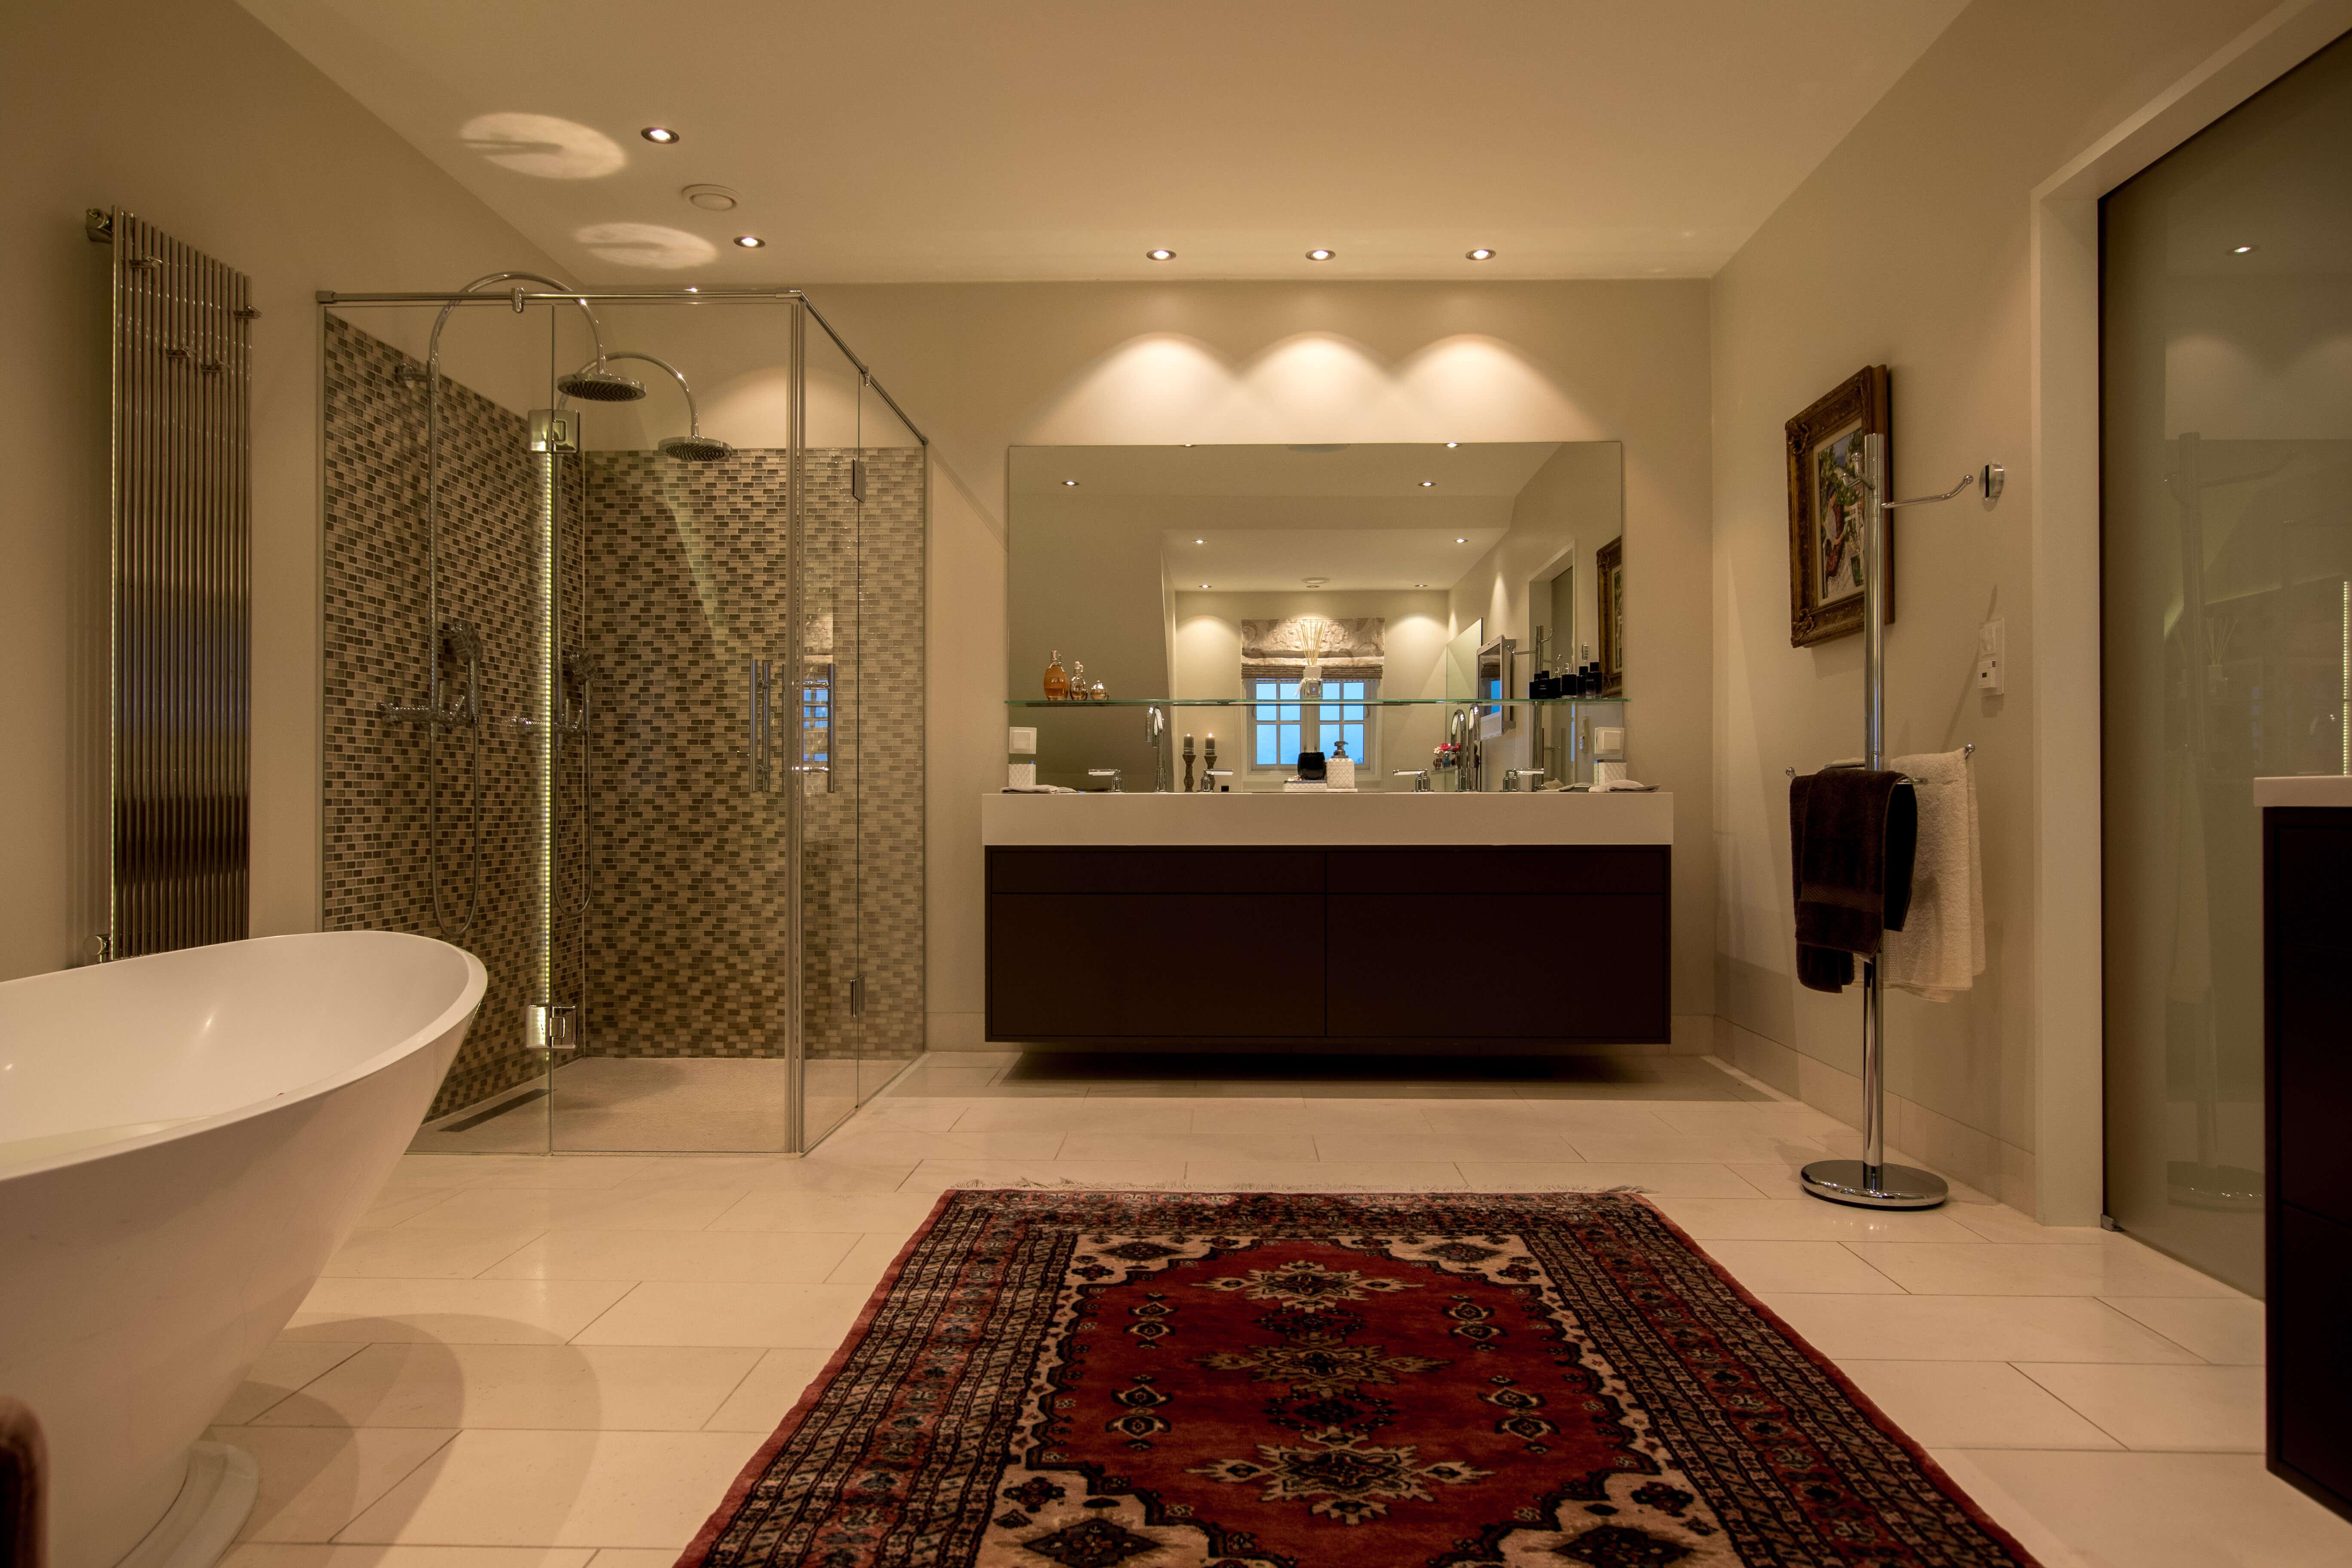 Main bathroom overview.